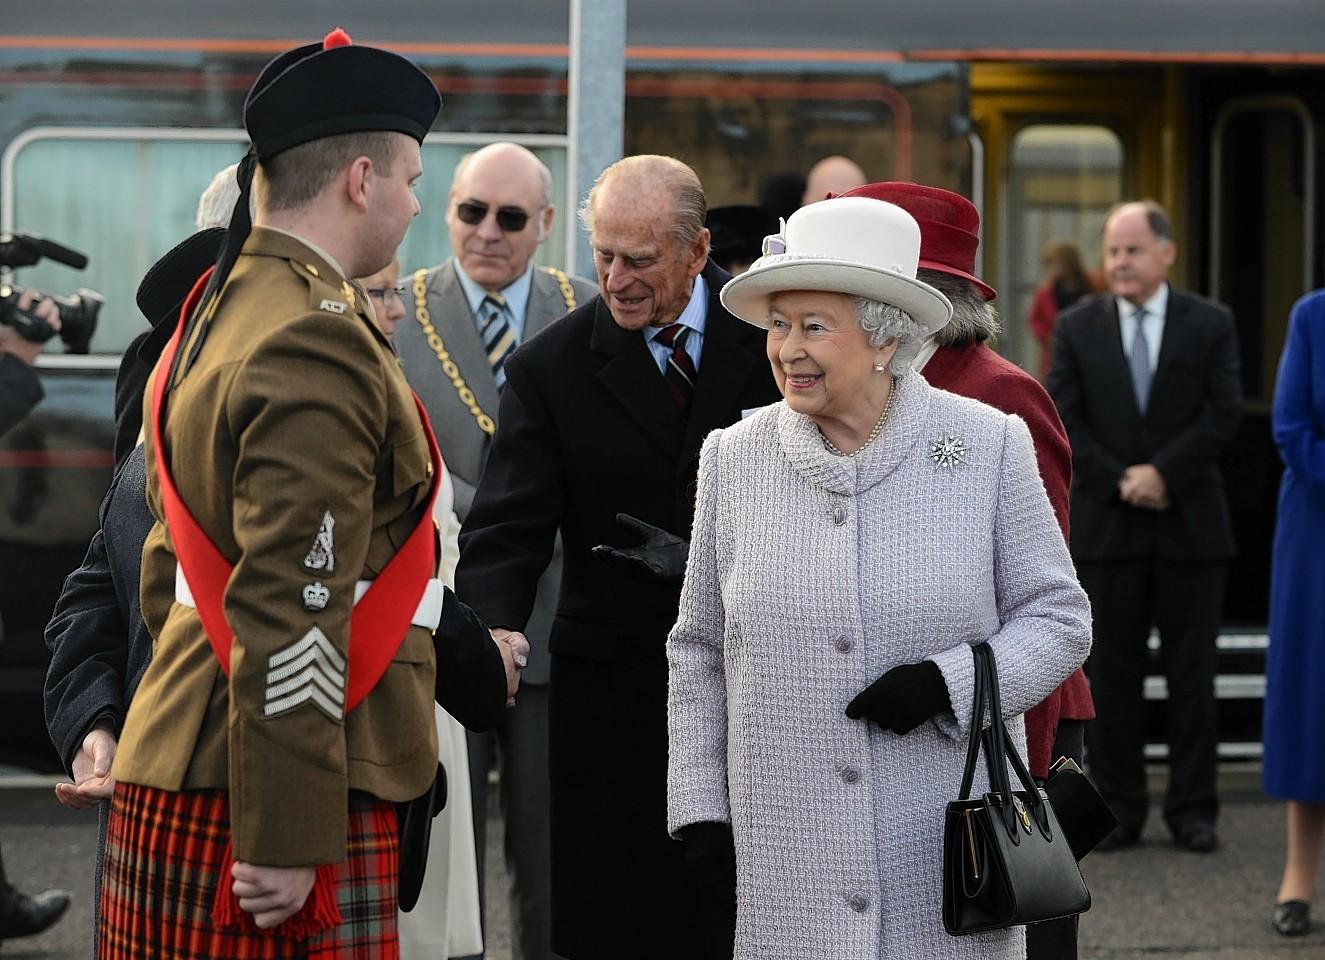 The Queen and Duke of Edinburgh meet  Pipe Major Ryan at Elgin Train Station